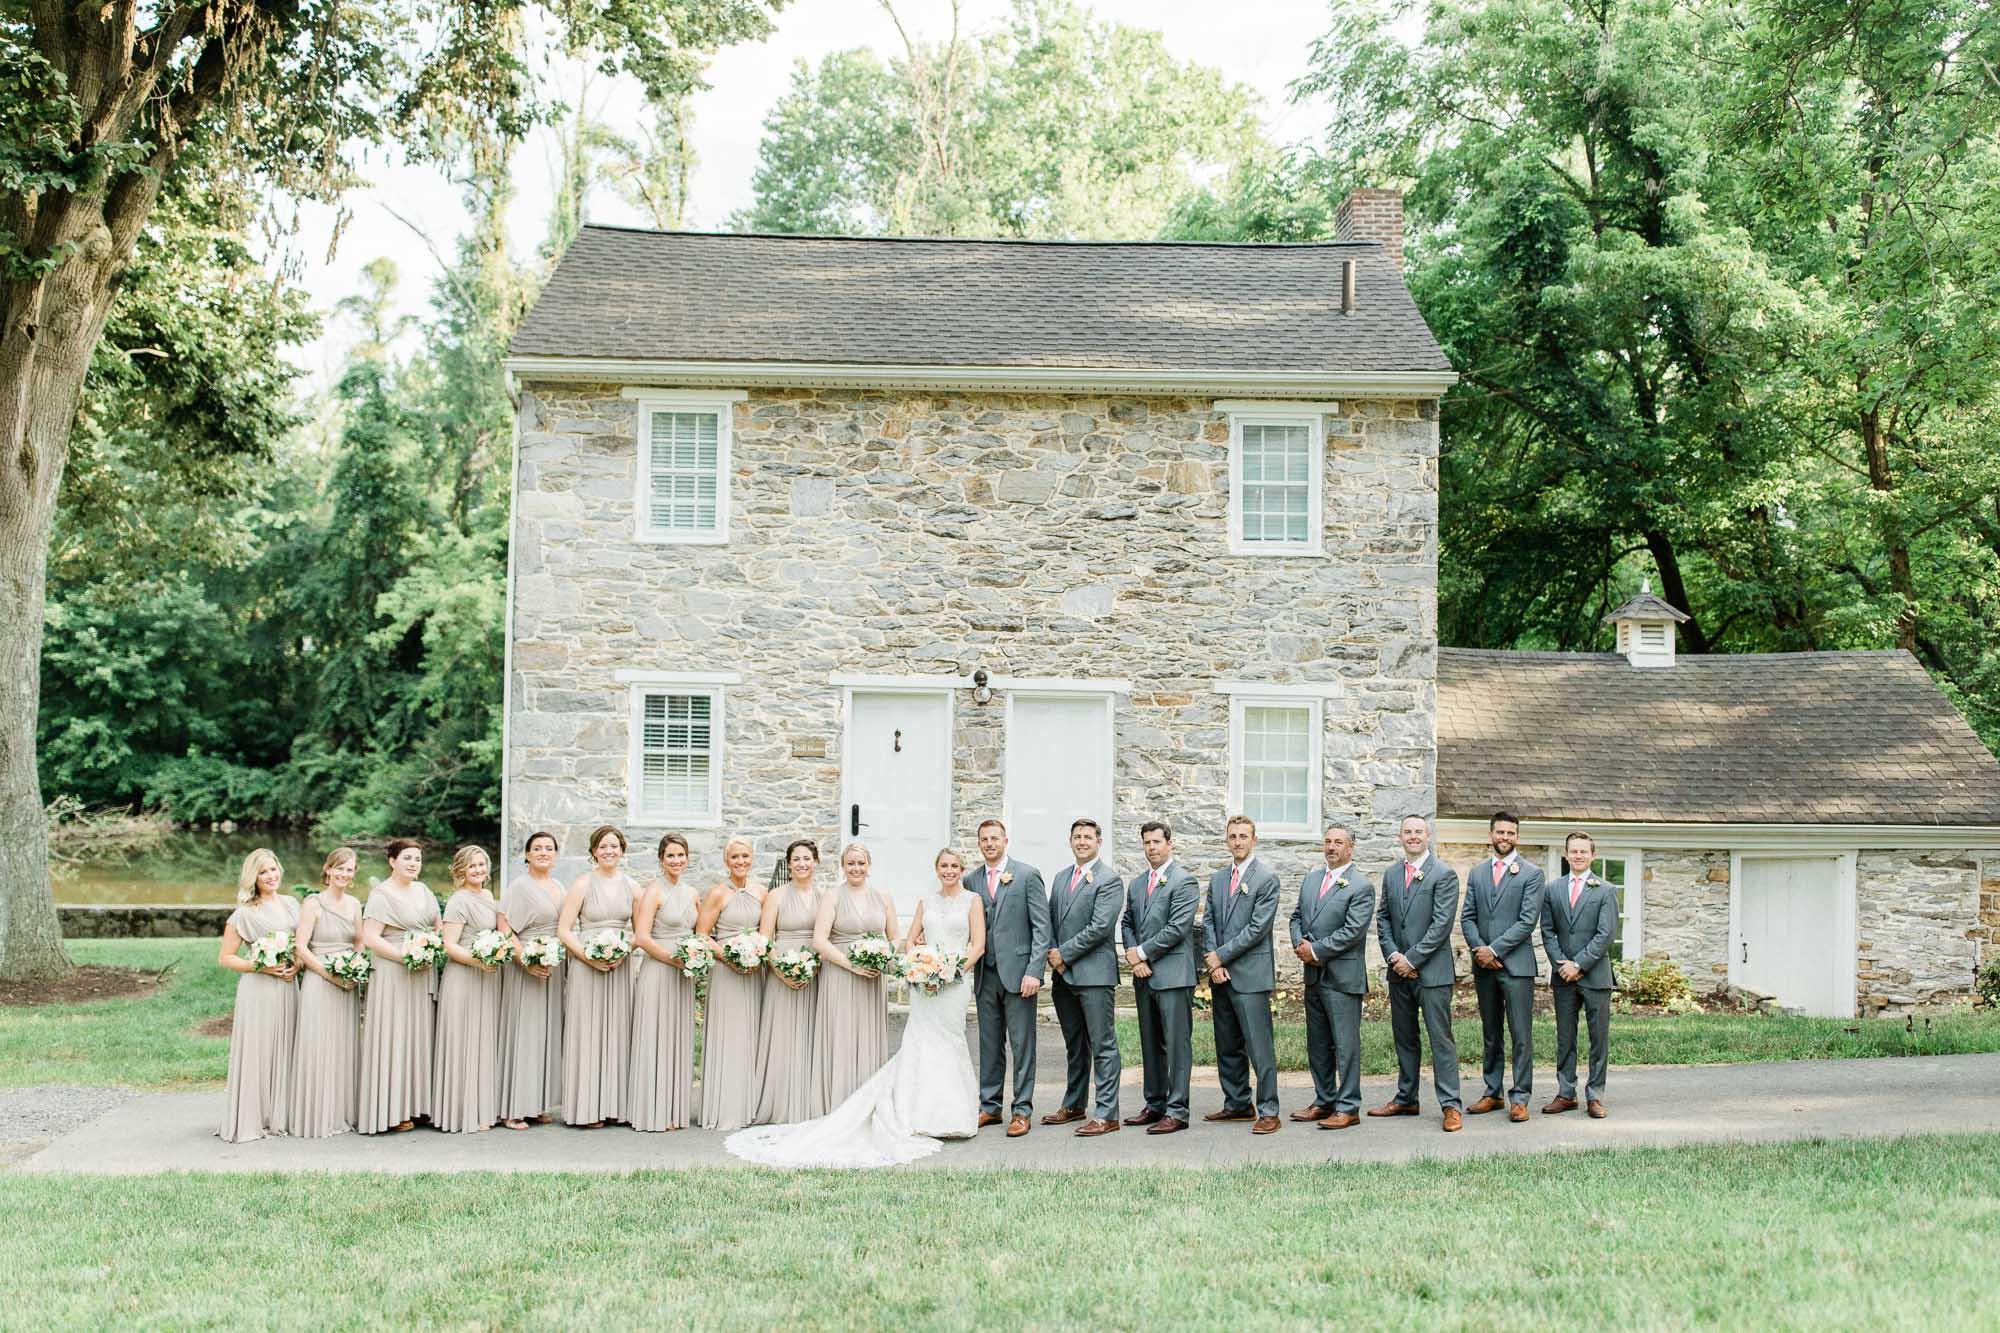 Allenberry-resort-historic-pennsylvania-wedding-10223.jpg